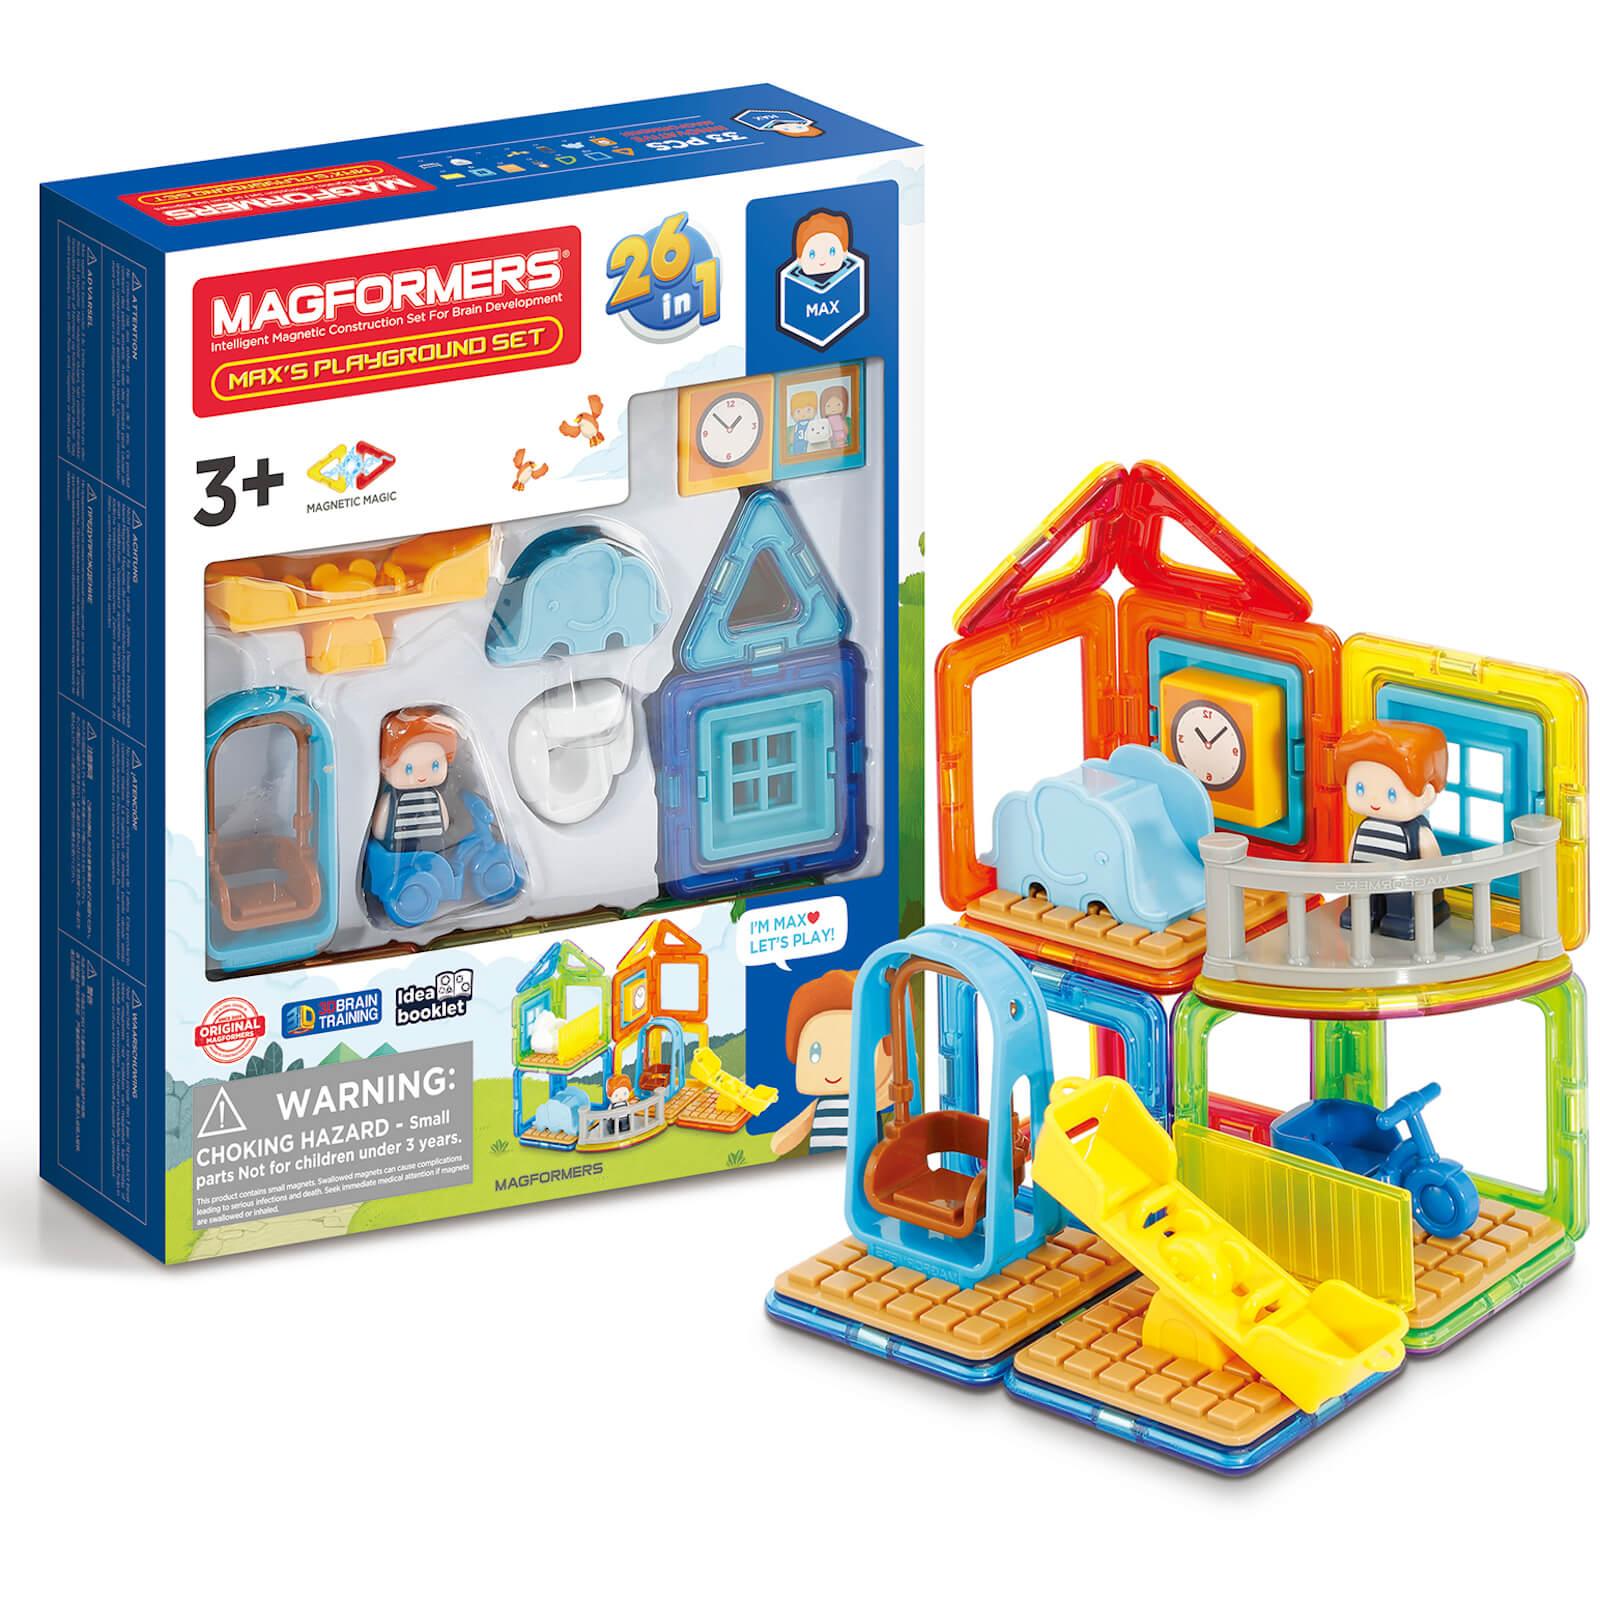 Magformers Maxs Playground